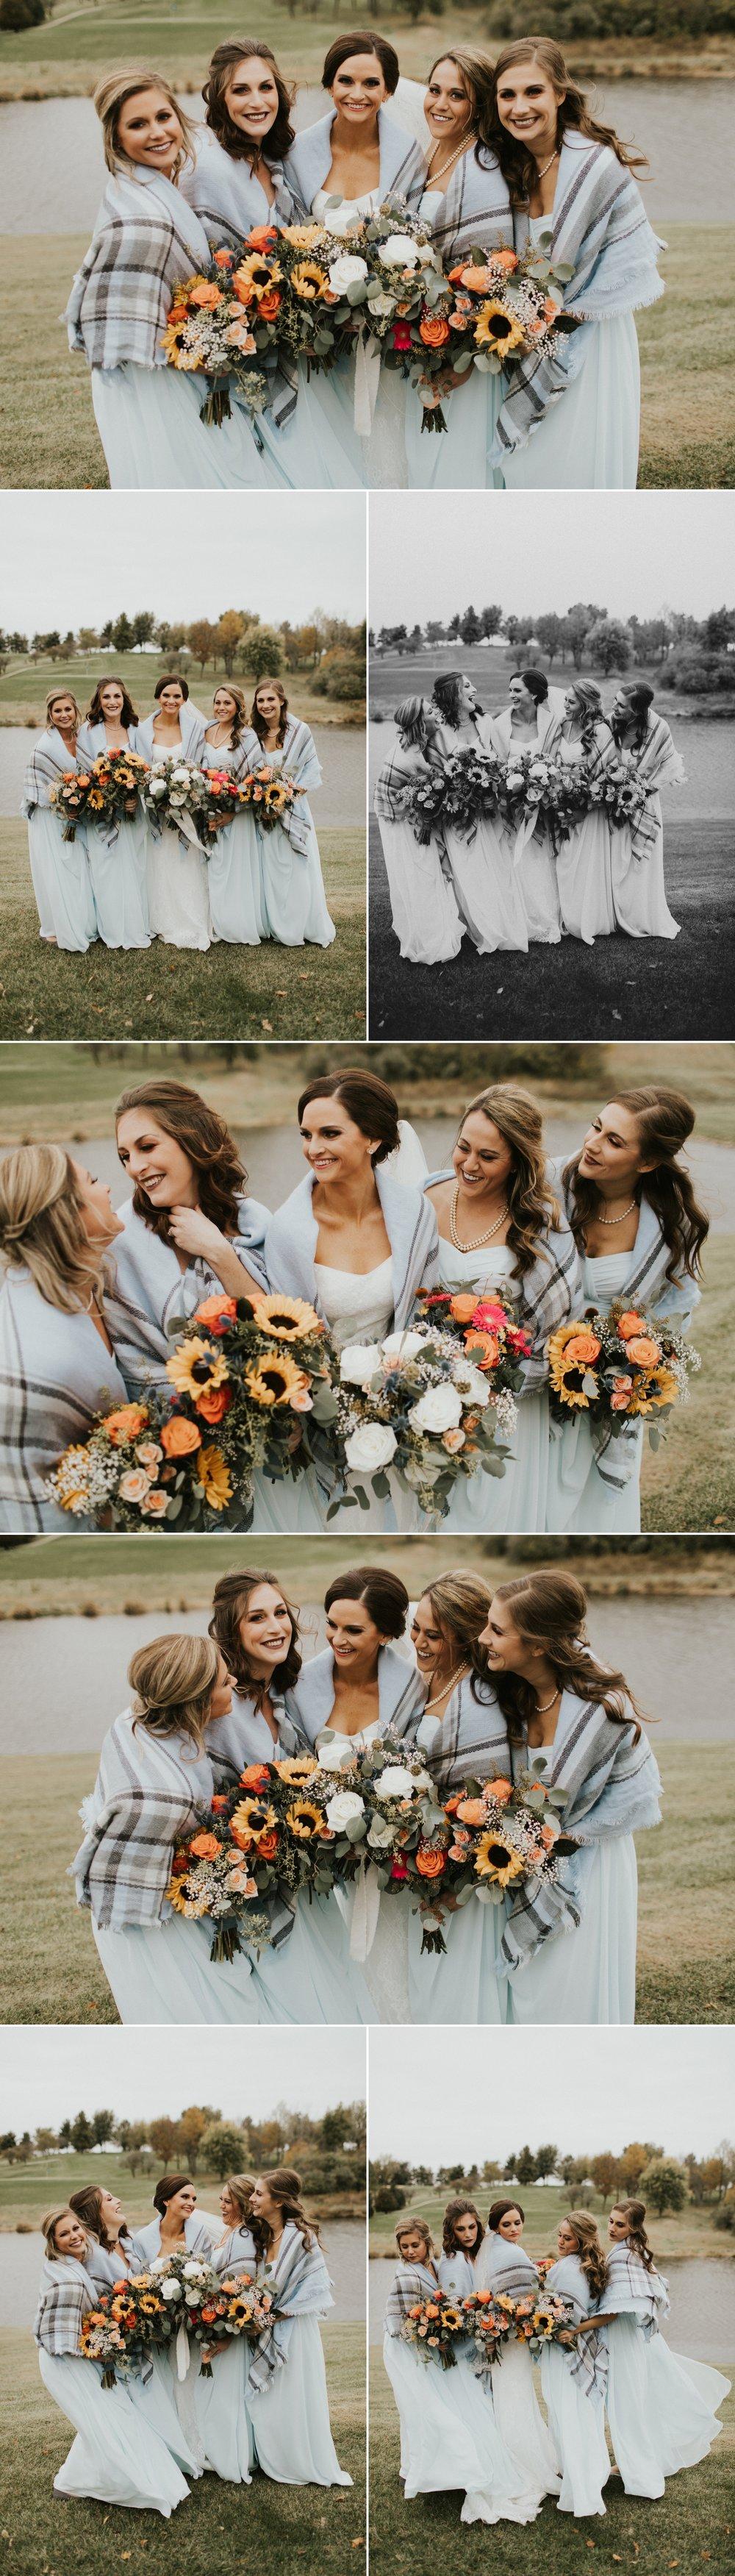 The Ault Wedding 4.jpg